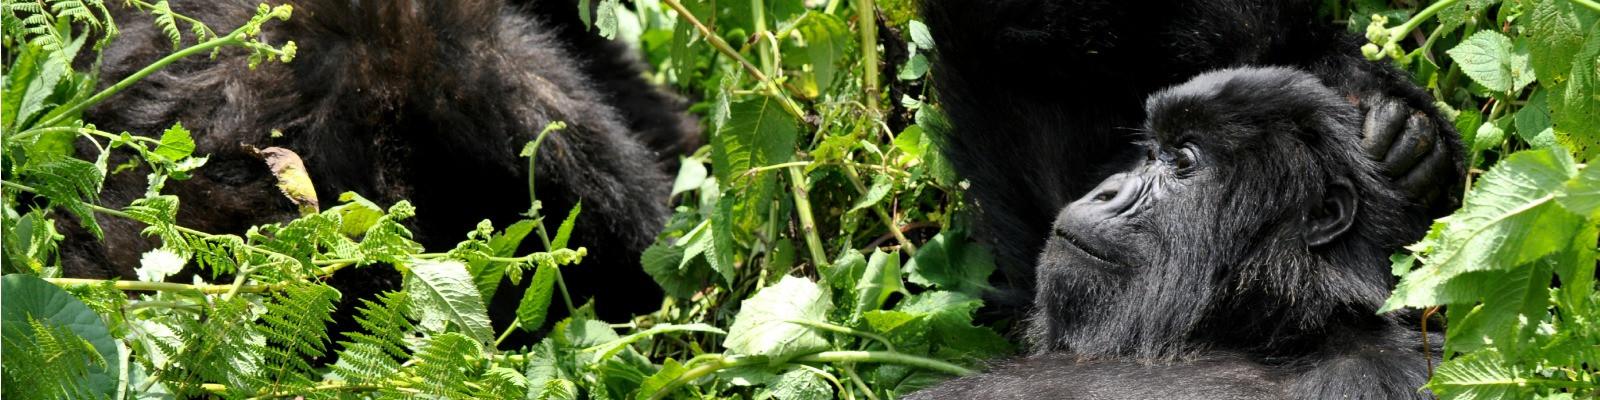 Gorilla Rwanda photo by Carine06